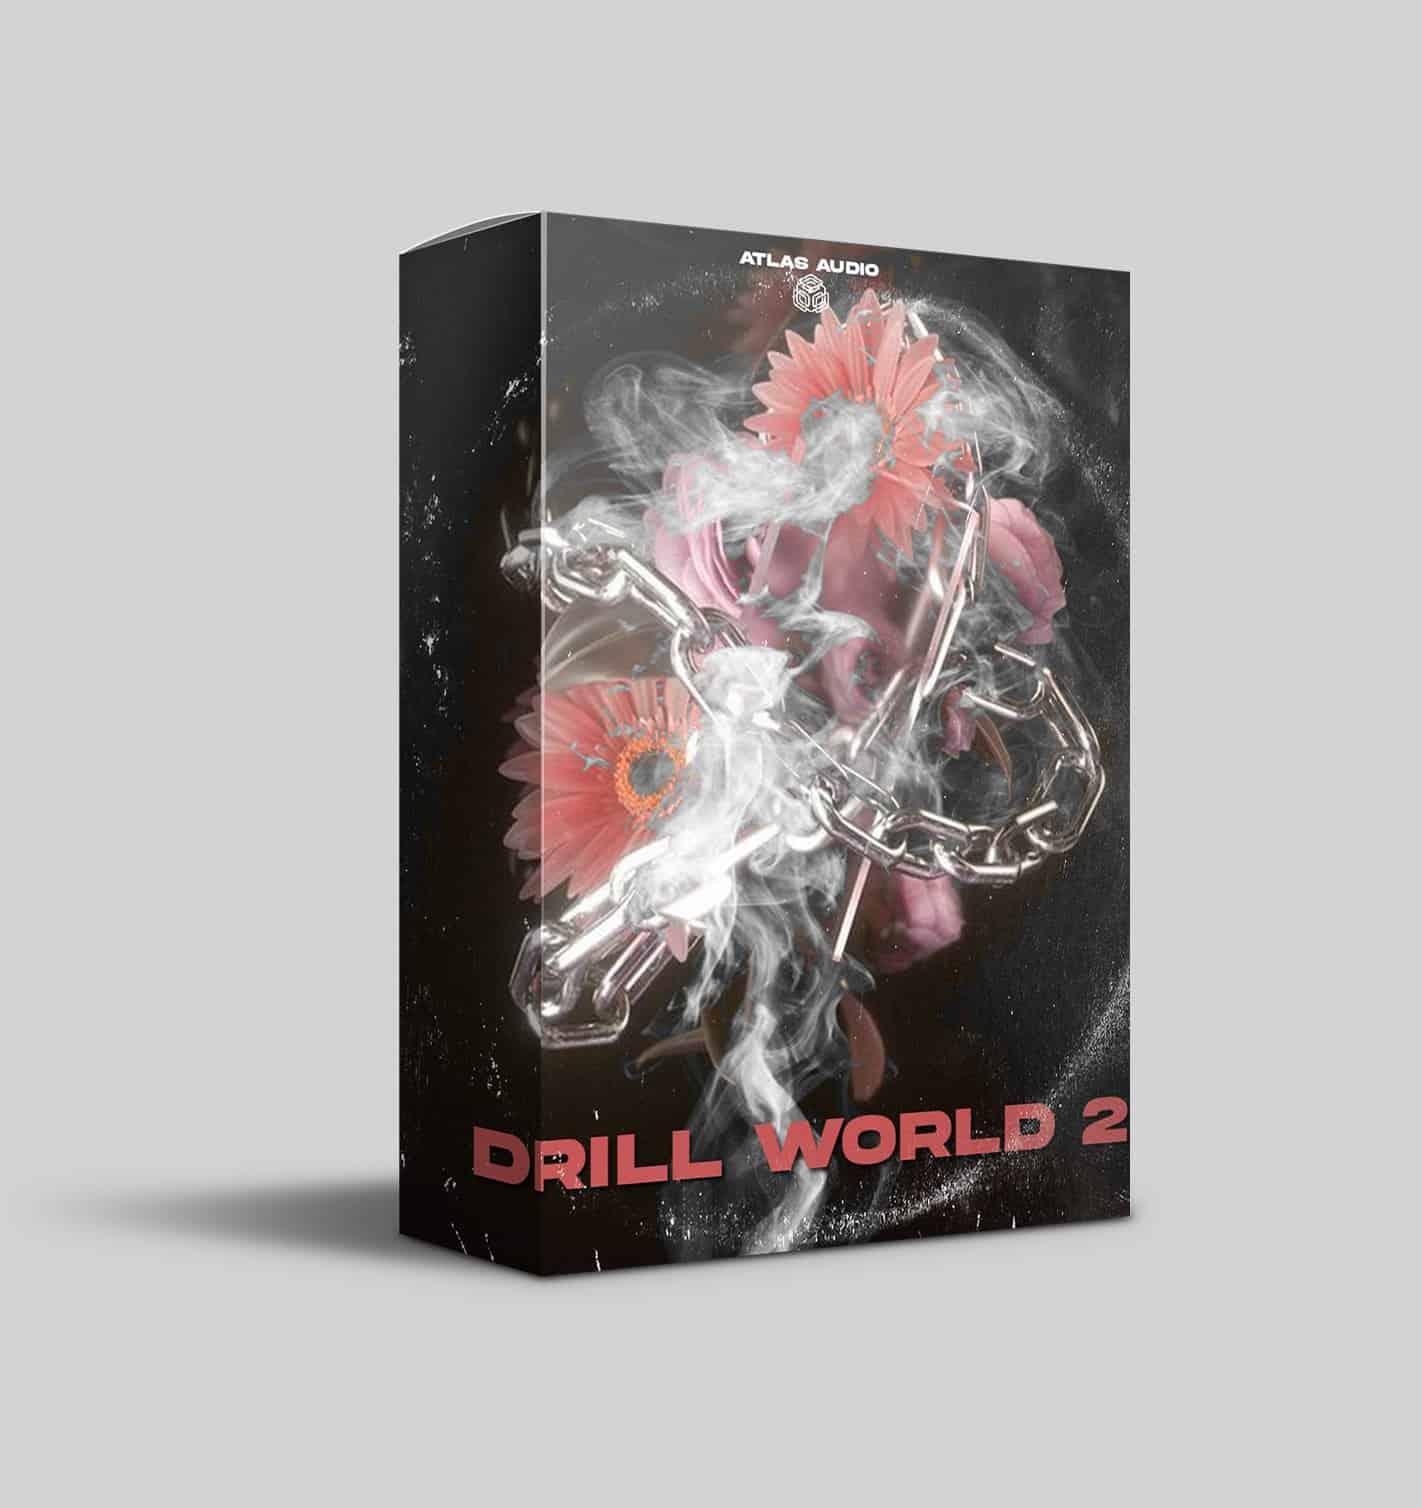 Atlas Audio Drill World 2